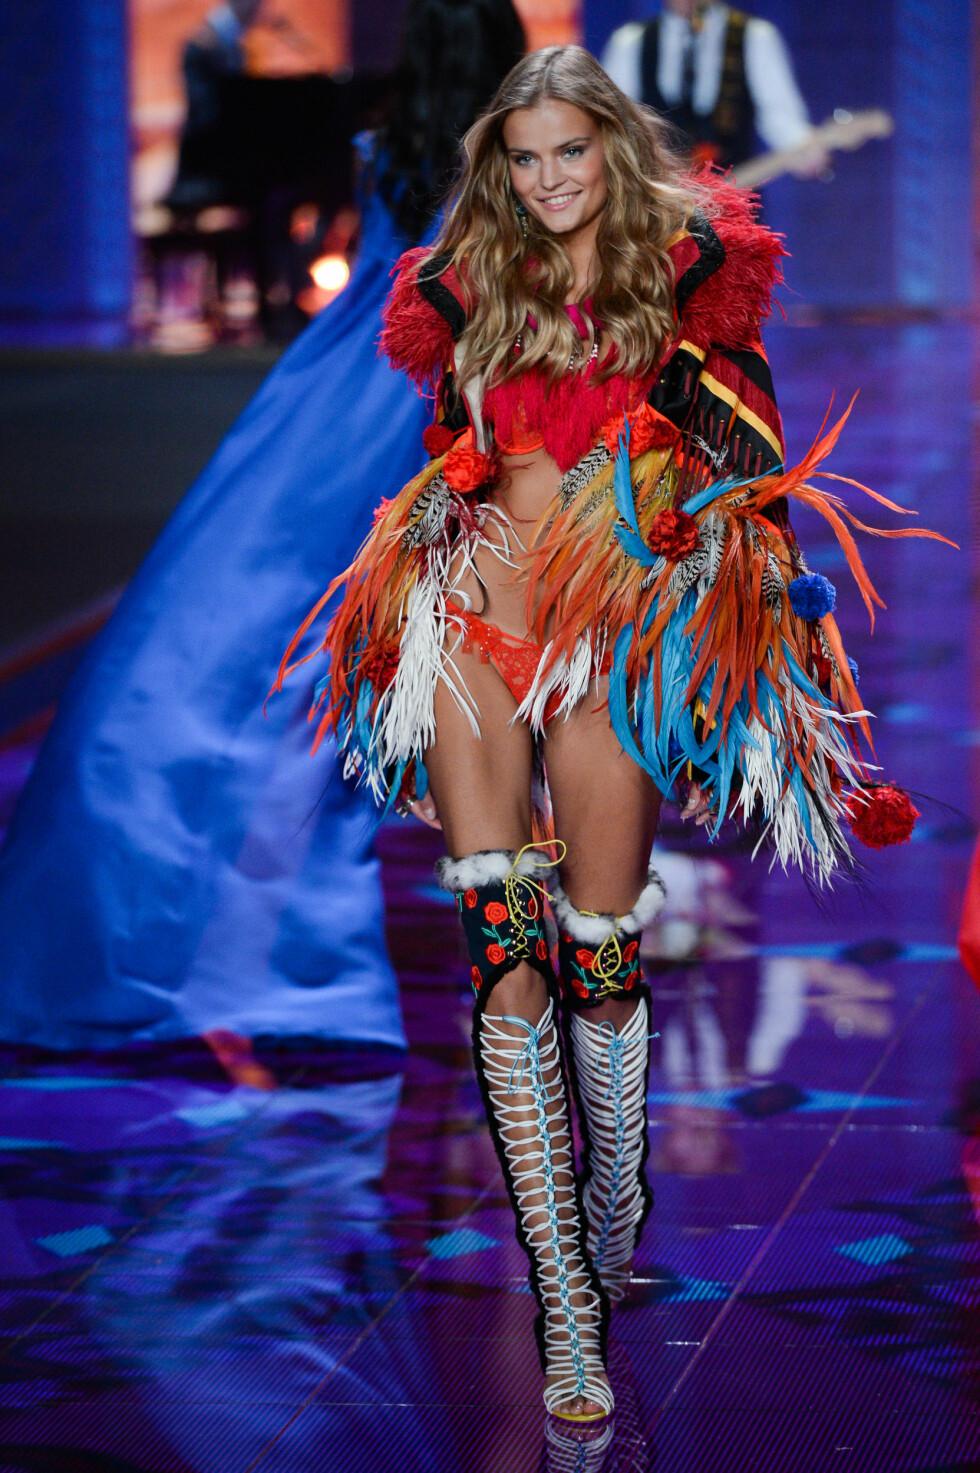 NR. 1: Kate Grigorieva er en 25 år gammel russisk modell, som var blant finalistene i Miss Russia 2012. Samme år kom hun på annenplass i «Russia's Next Top Model».  Foto: Abaca